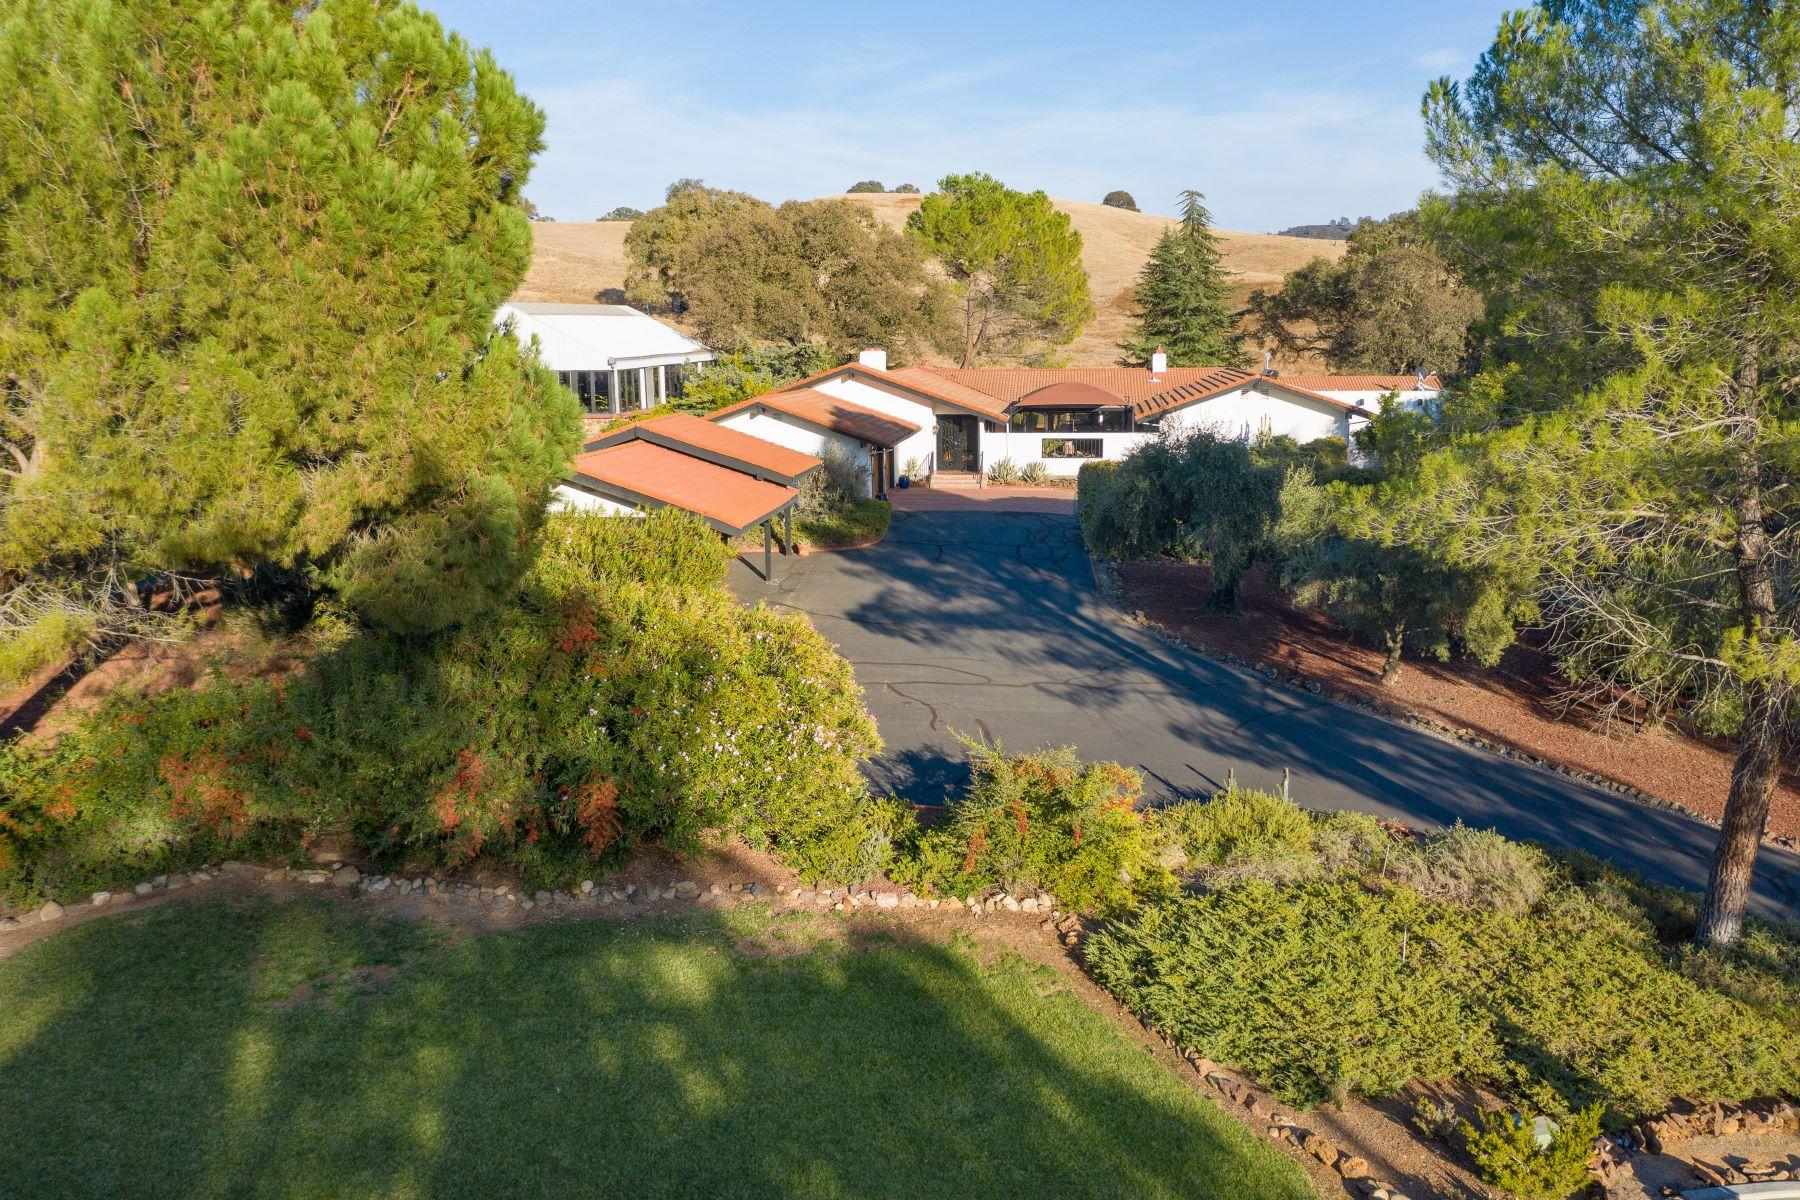 农场 / 牧场 / 种植园 为 销售 在 Spanish Revival Estate Located on 60 Sprawling Acres 6100 Gassner Road Burson, 加利福尼亚州 95225 美国